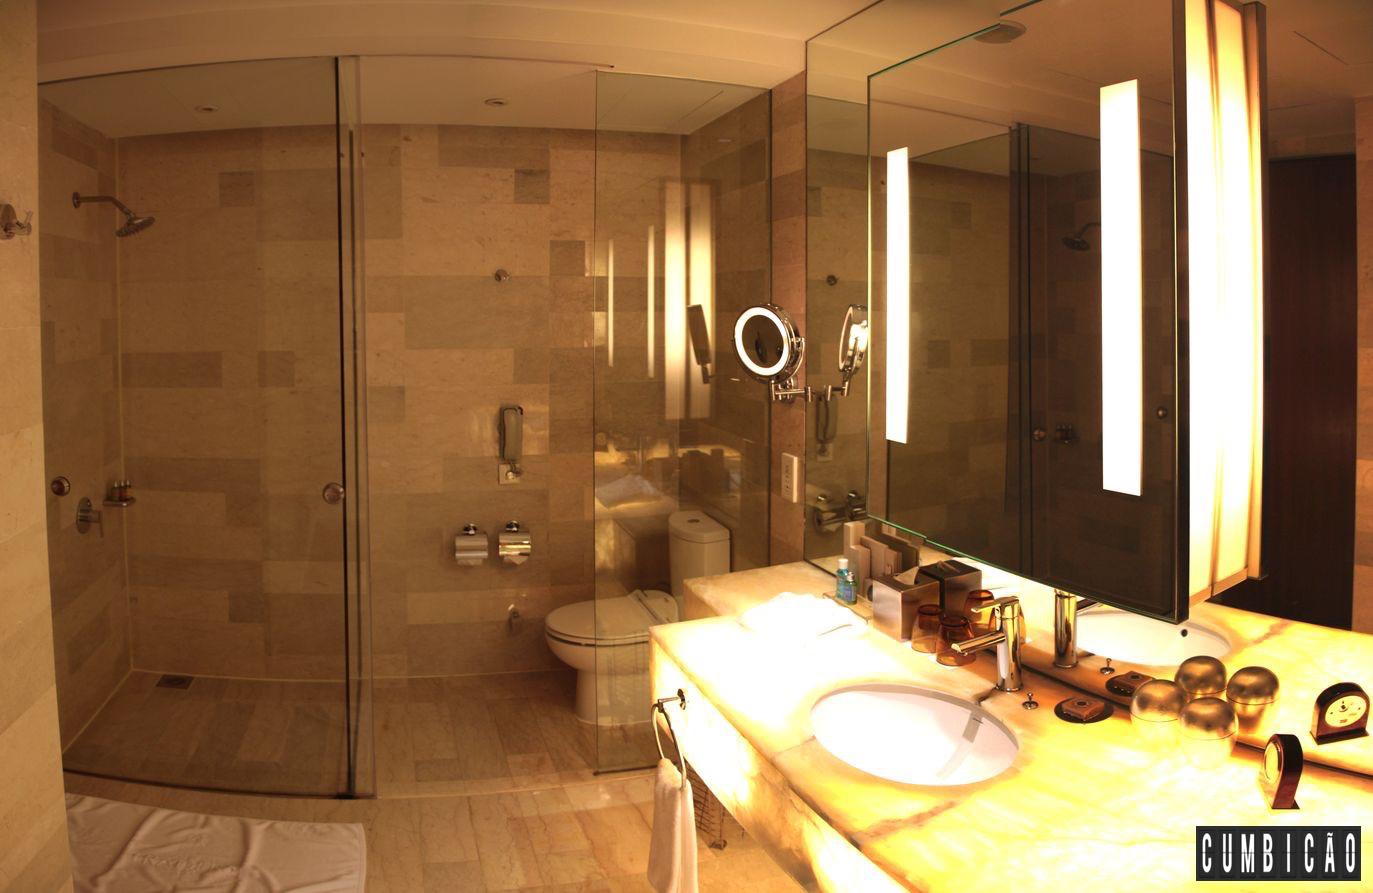 Onde Ficar em Kuala Lumpur? Traders Hotel um 5 estrelas maravilhoso #C48207 1373 893